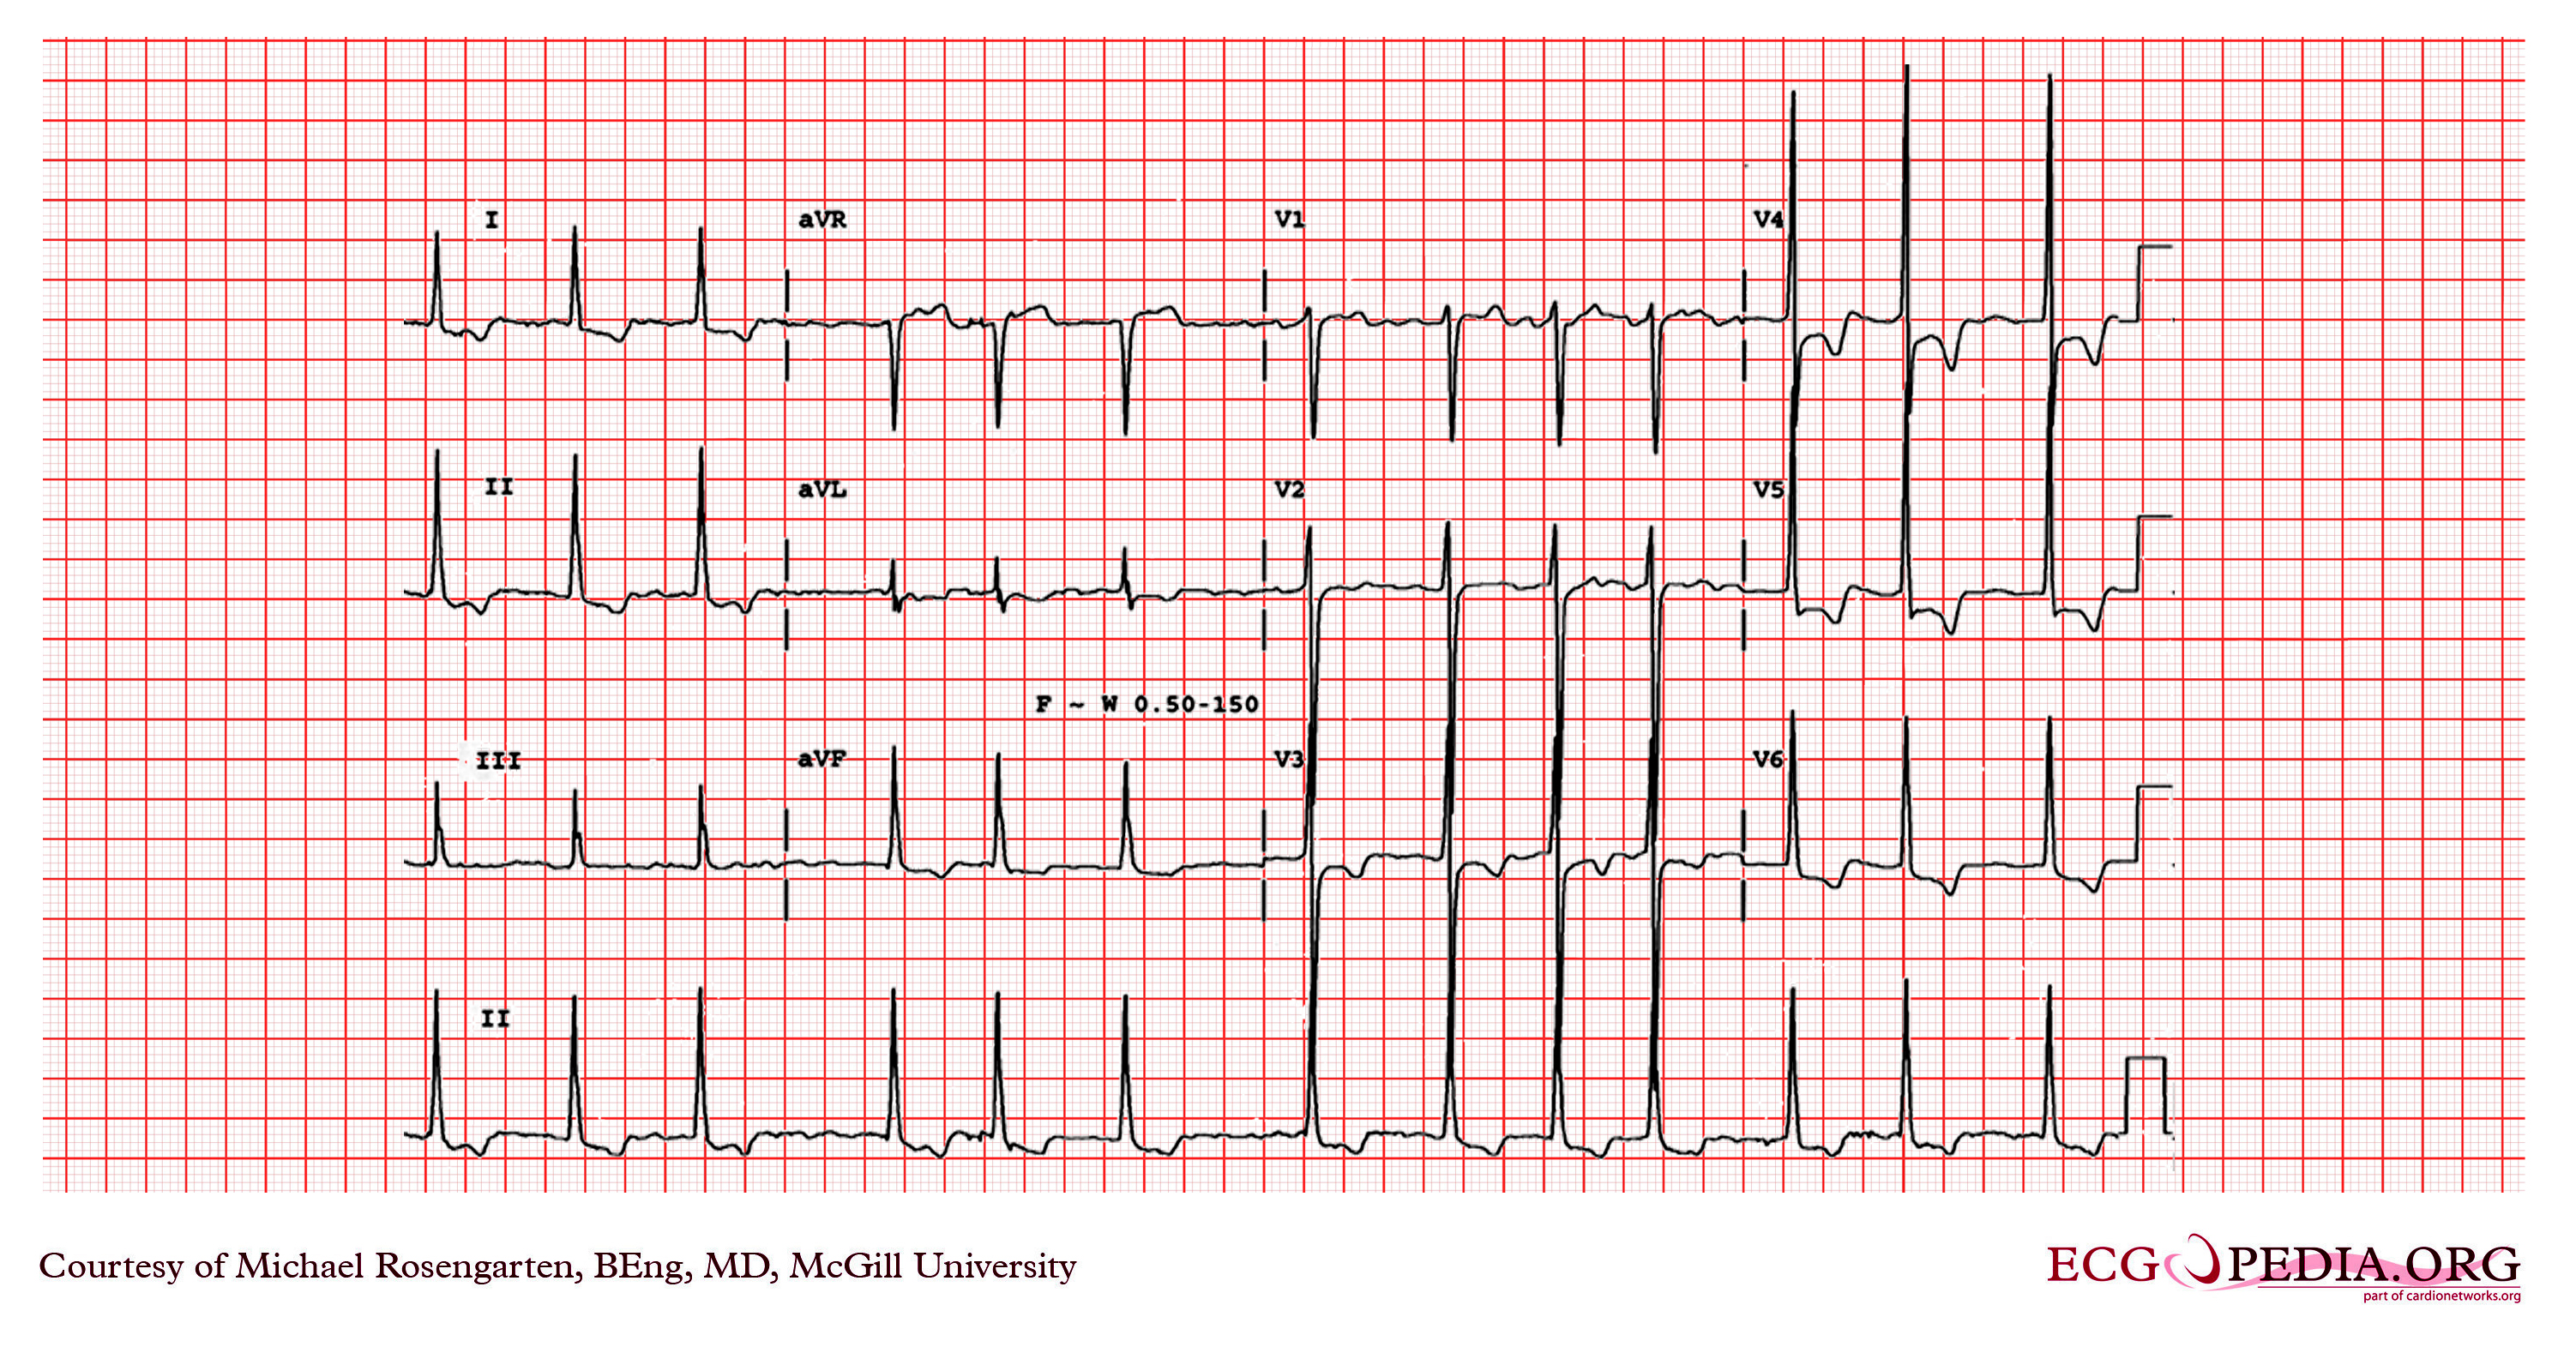 Pulmonary hypertension case studies